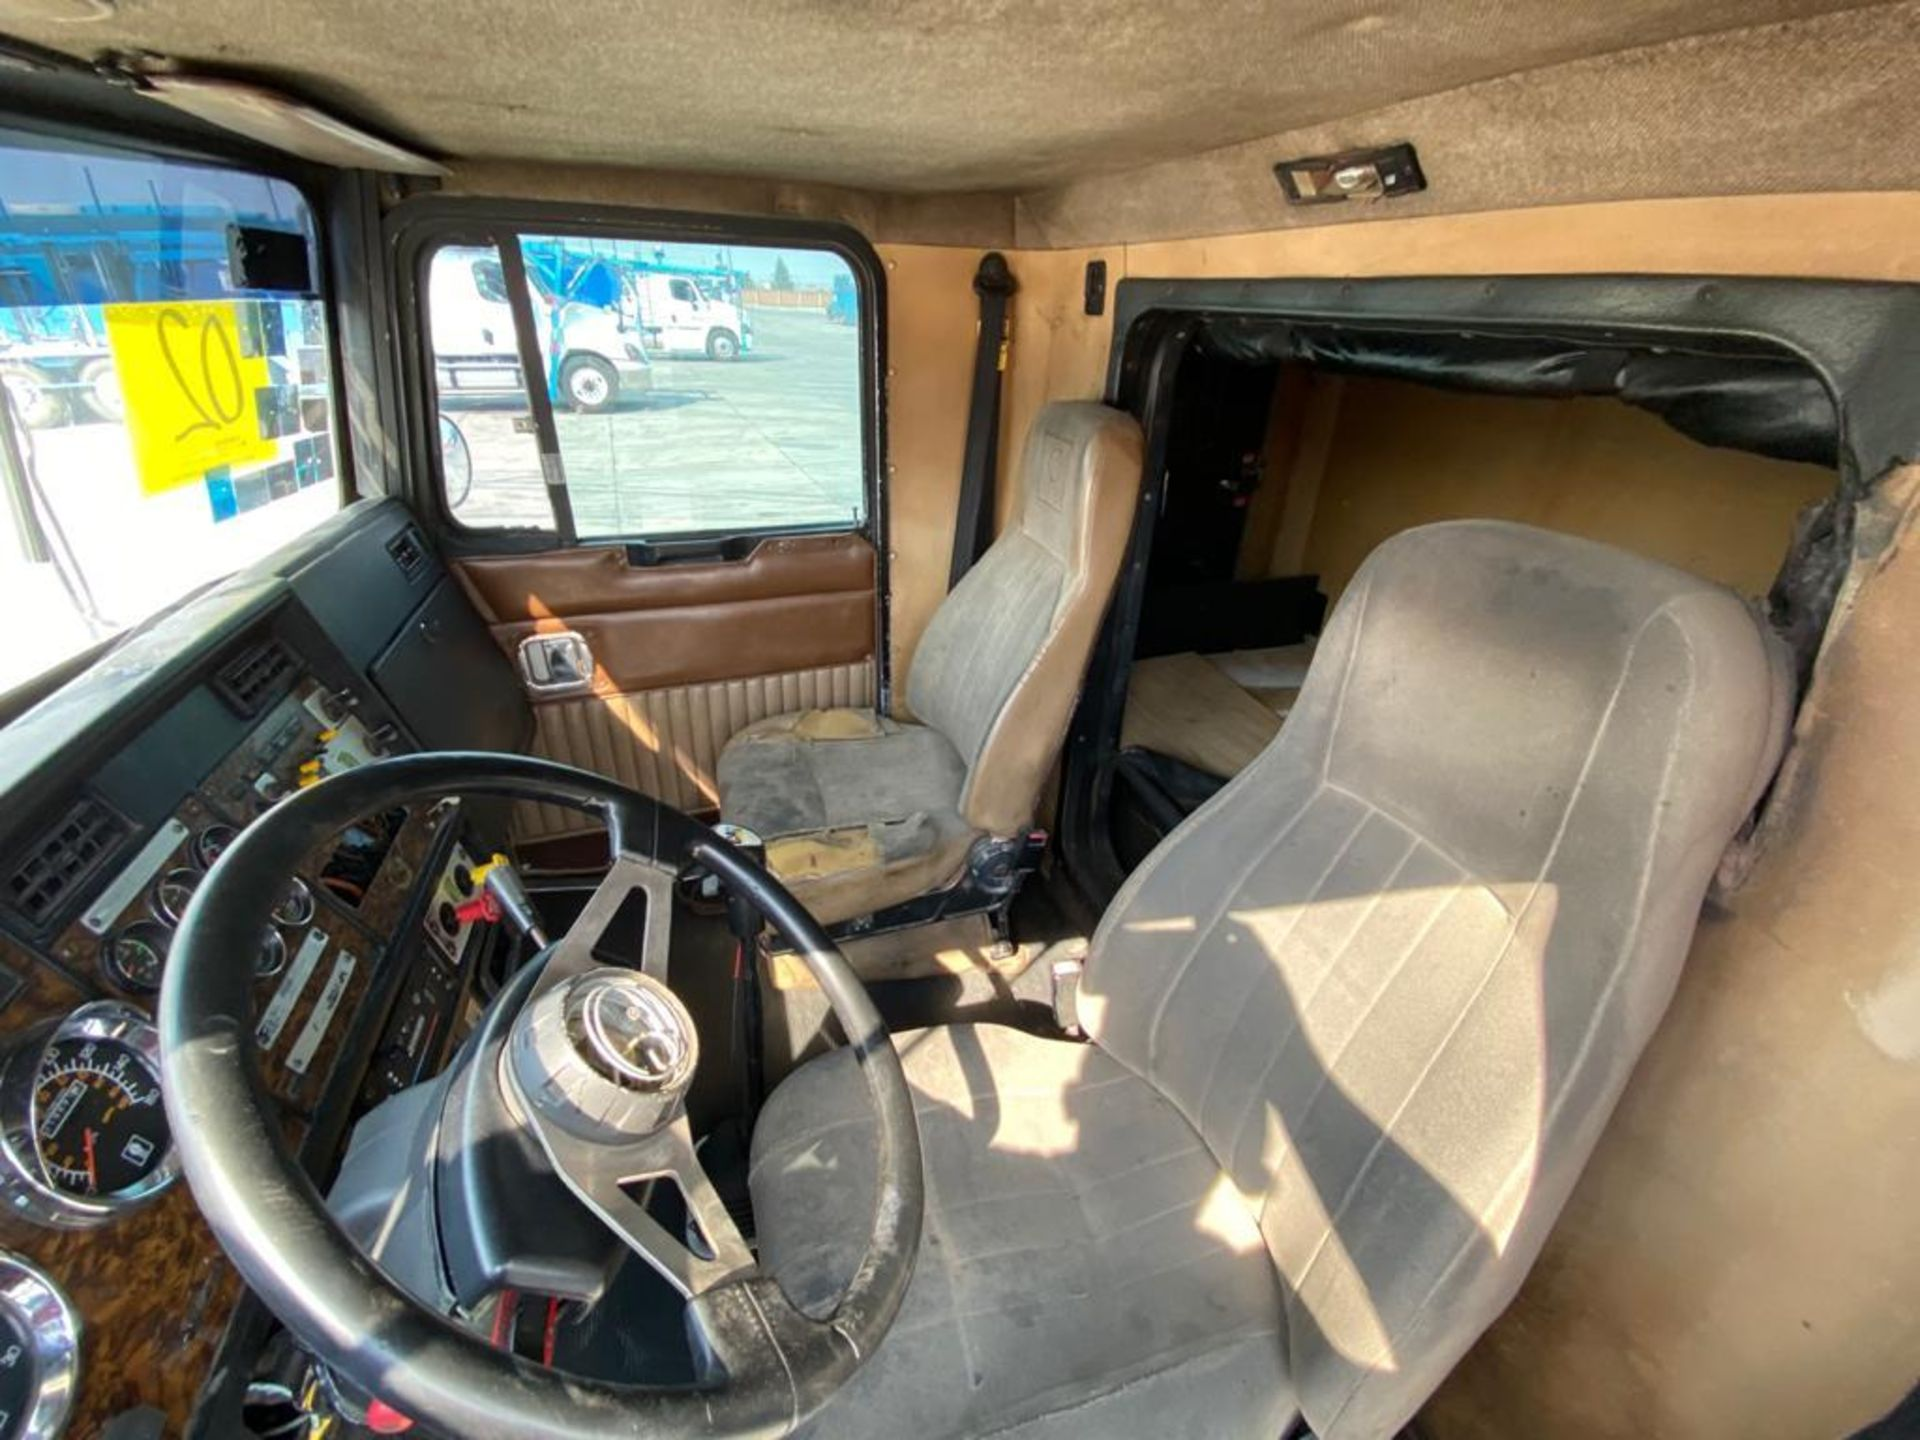 1999 Kenworth Sleeper truck tractor, standard transmission of 18 speeds - Image 38 of 75